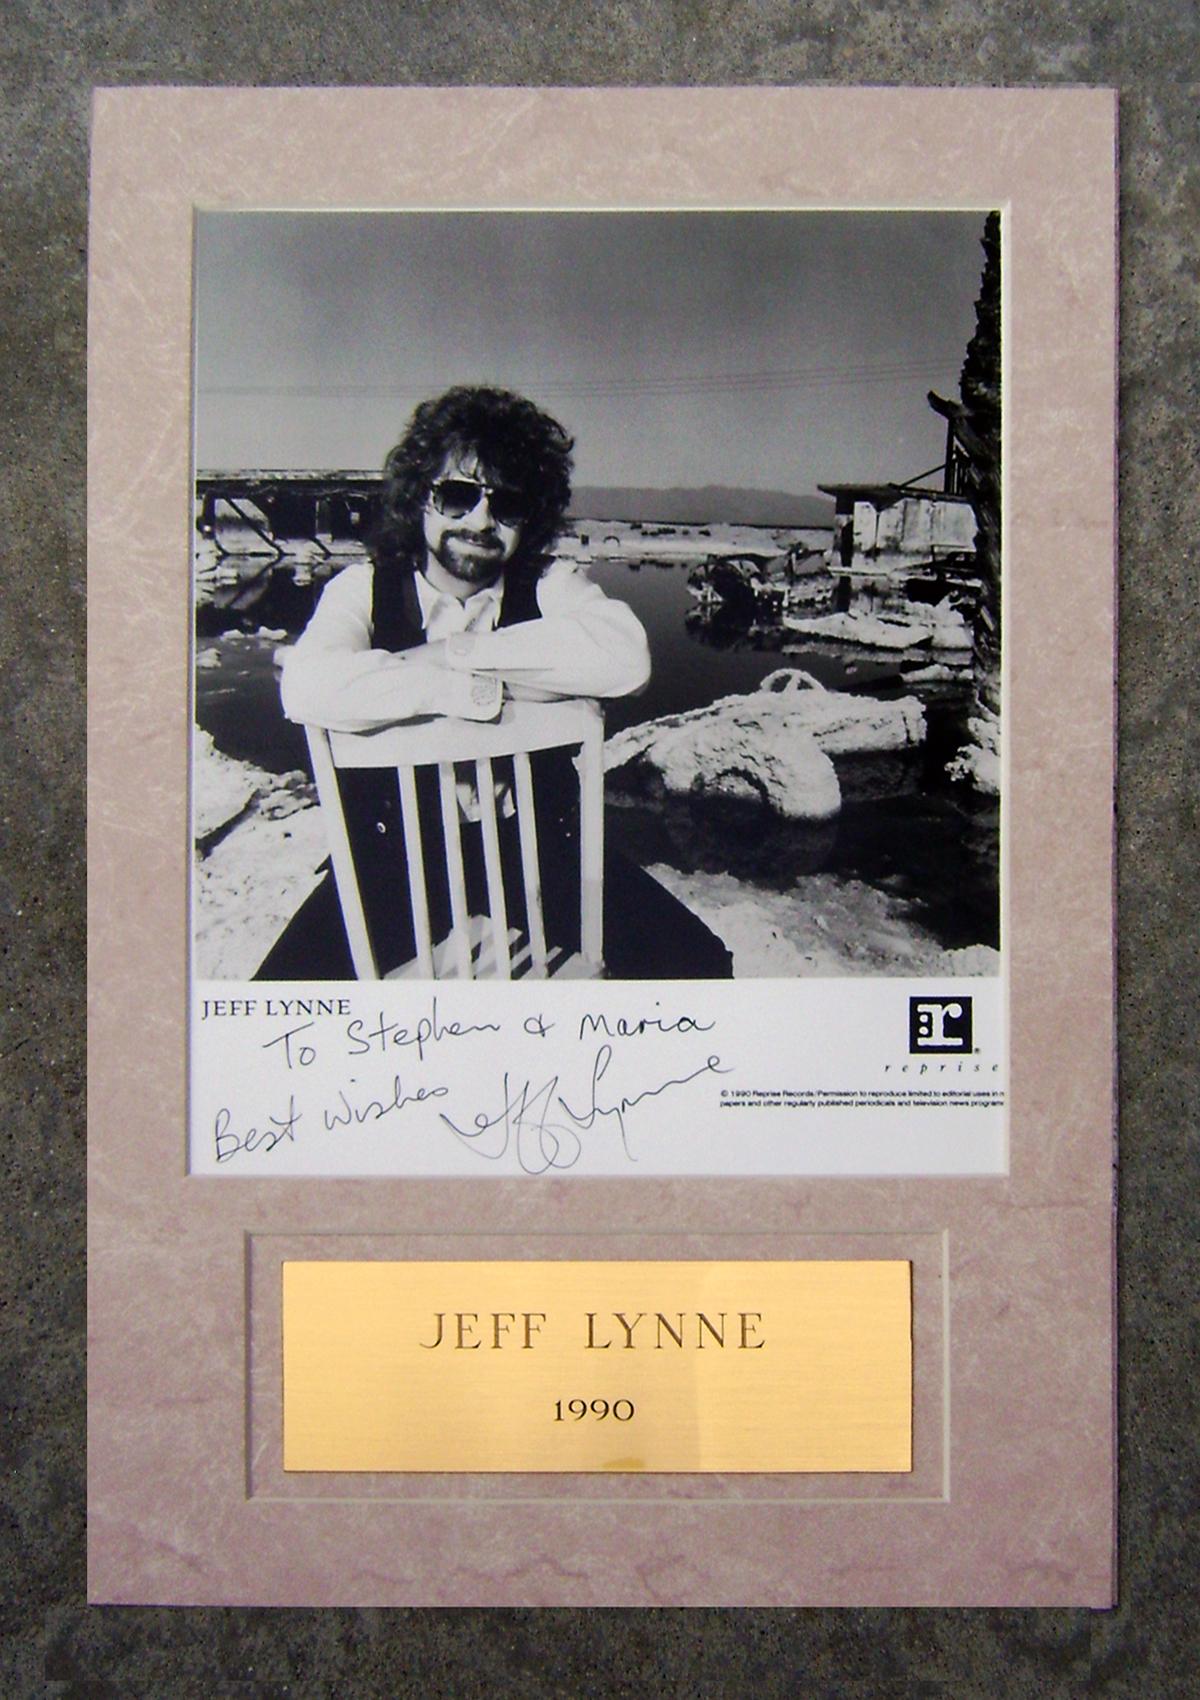 Photo - Framed - Jeff Lynne